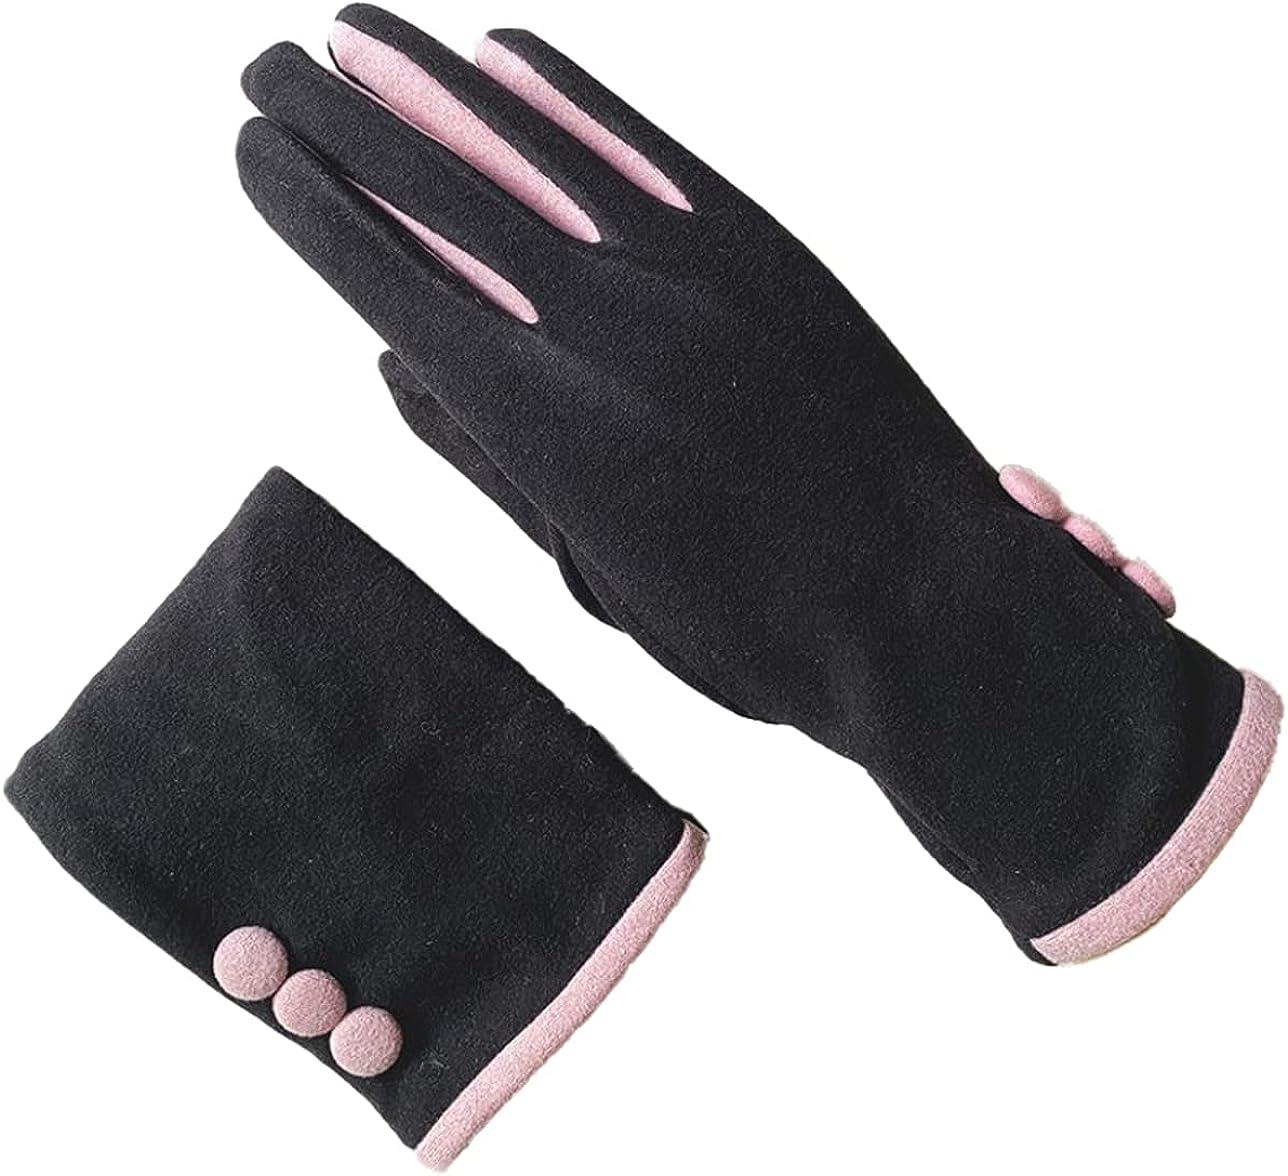 ATHX Women Windproof Fleece Lined Thick Warm Driving Gloves